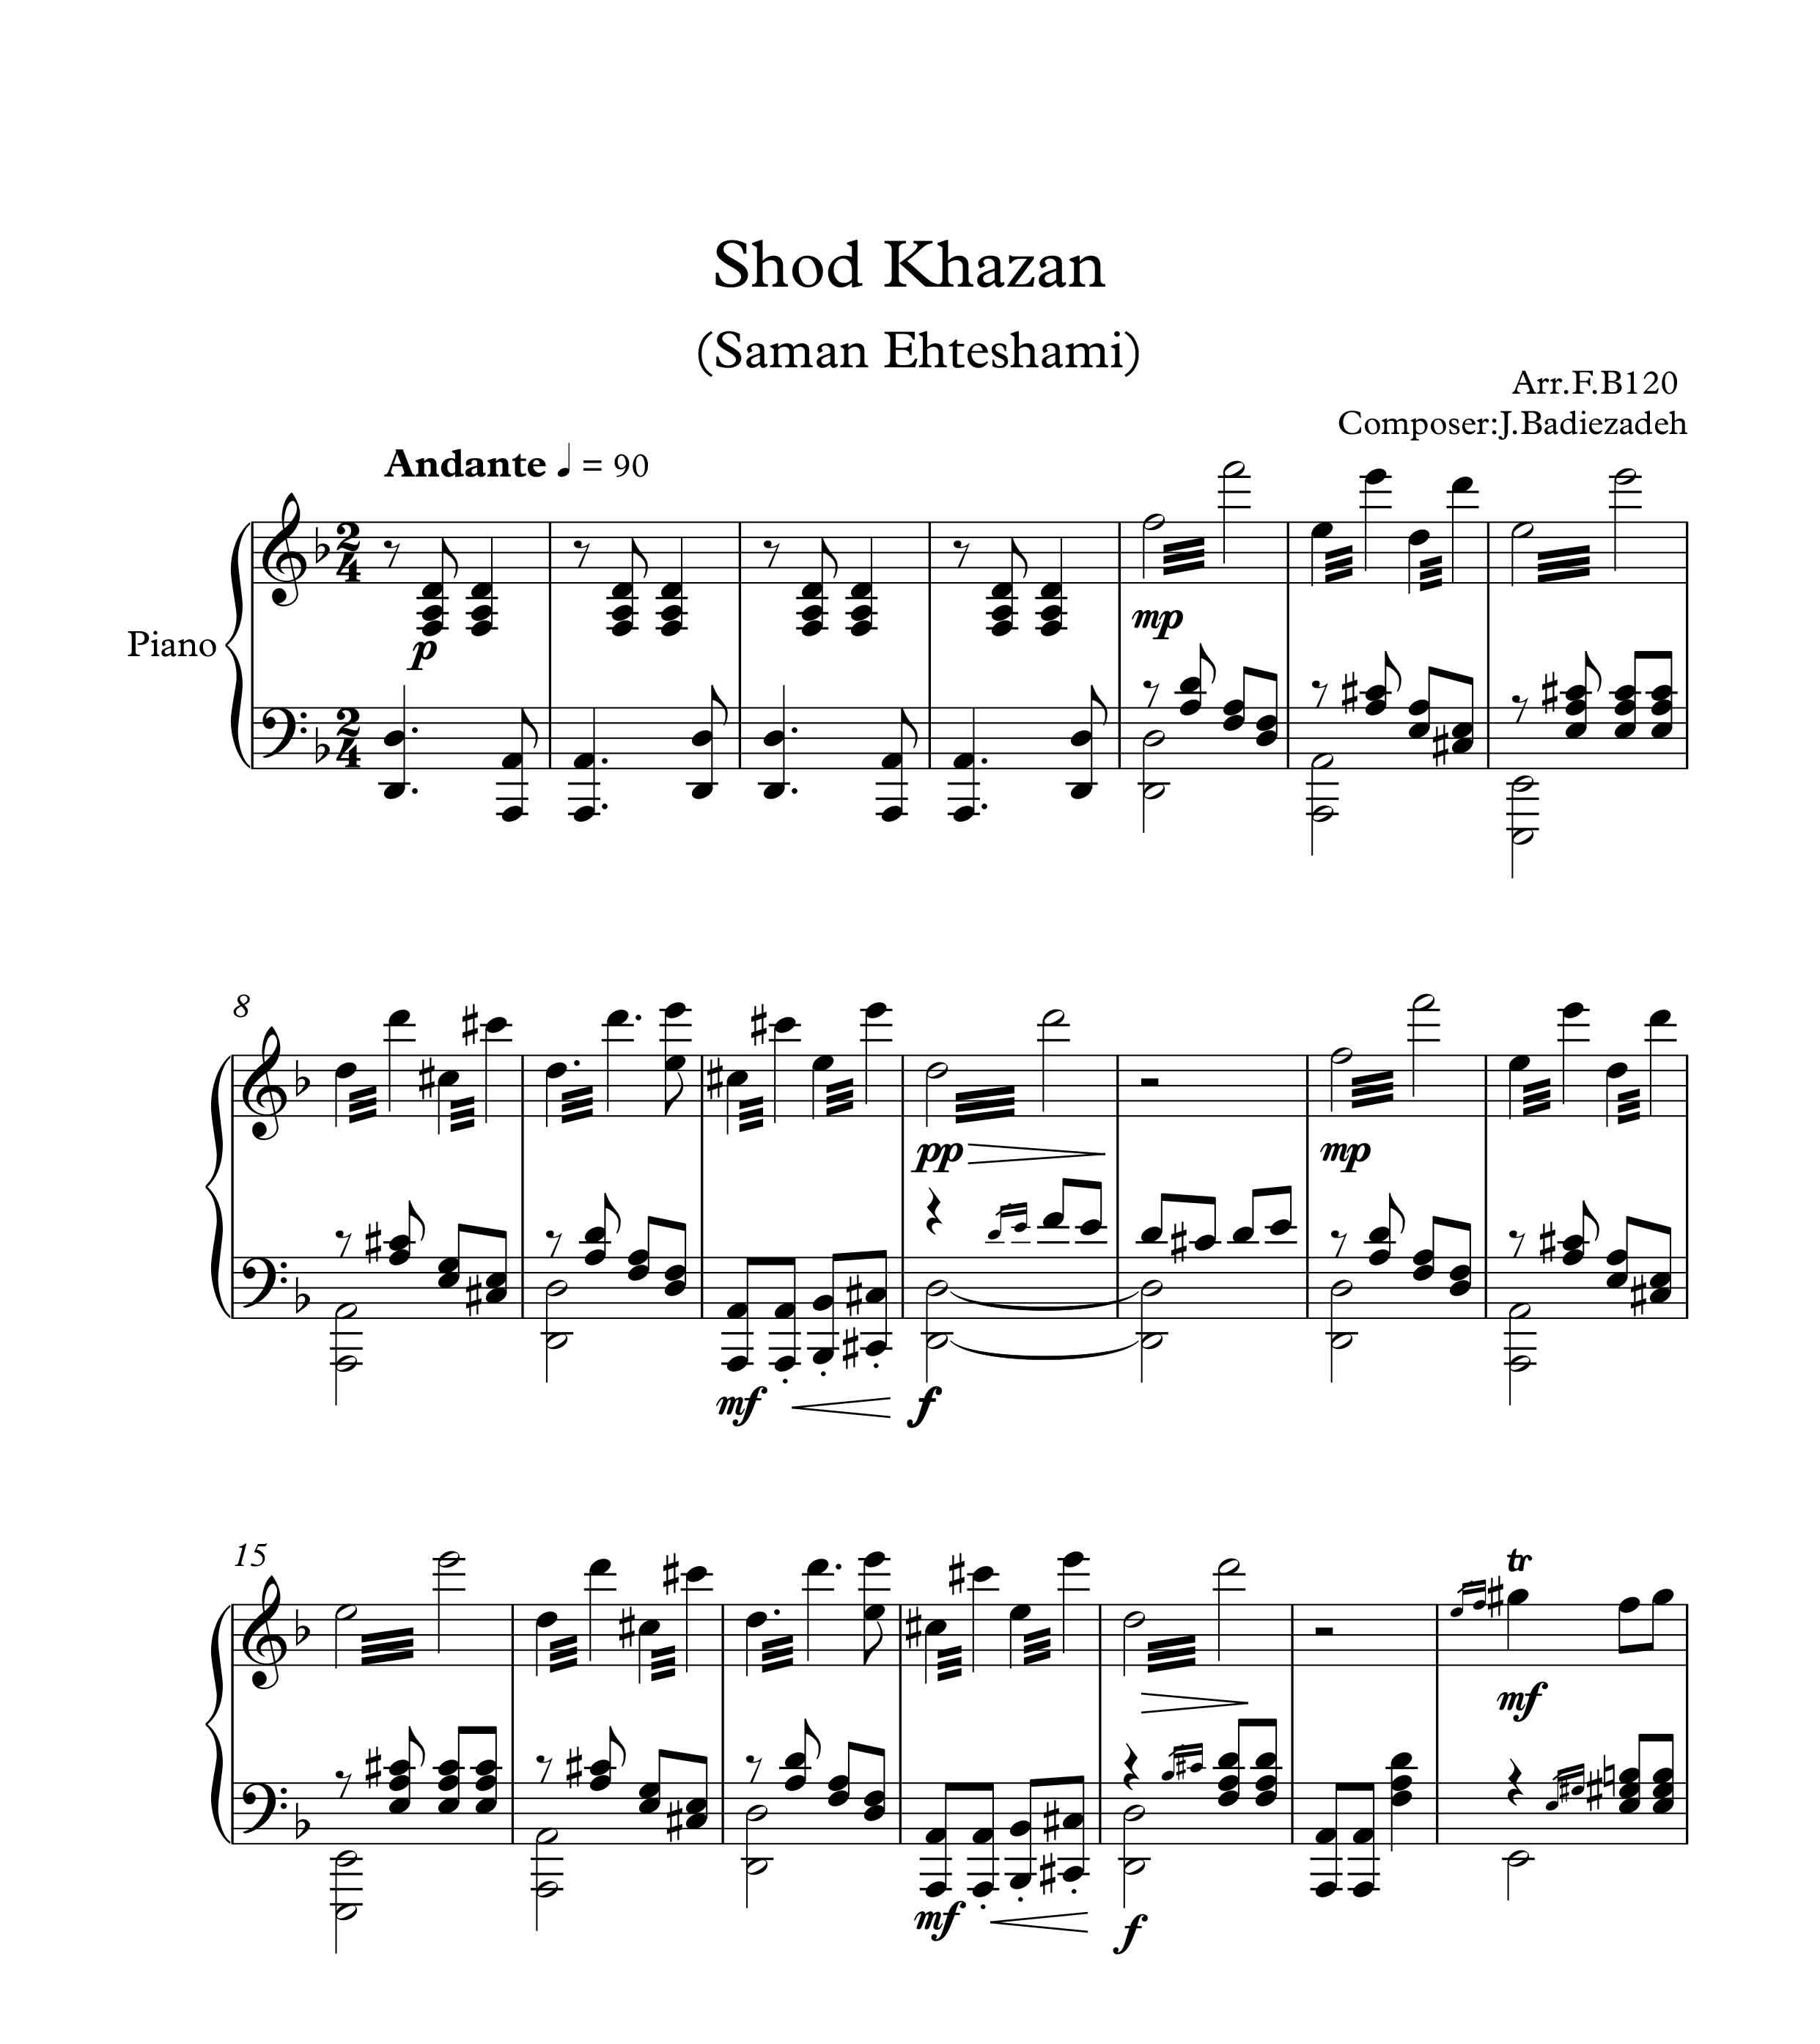 نت پیانوی خزان عشق از سامان احتشامی